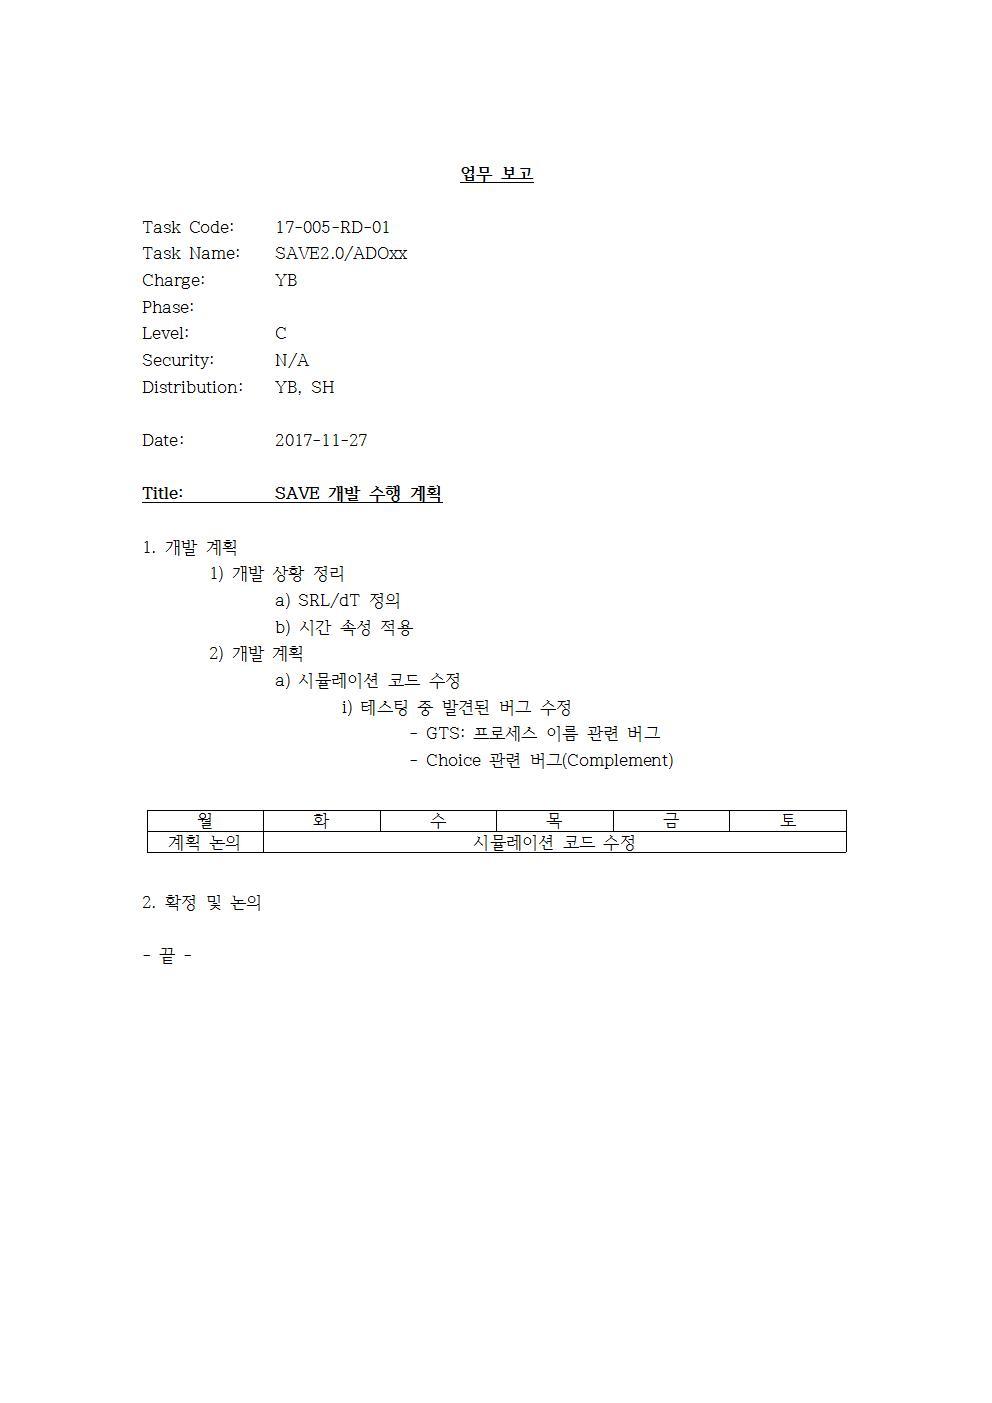 D-[17-005-RD-01]-[SAVE 2.0 ADOxx]-[YB]-[2017-11-27]001.jpg